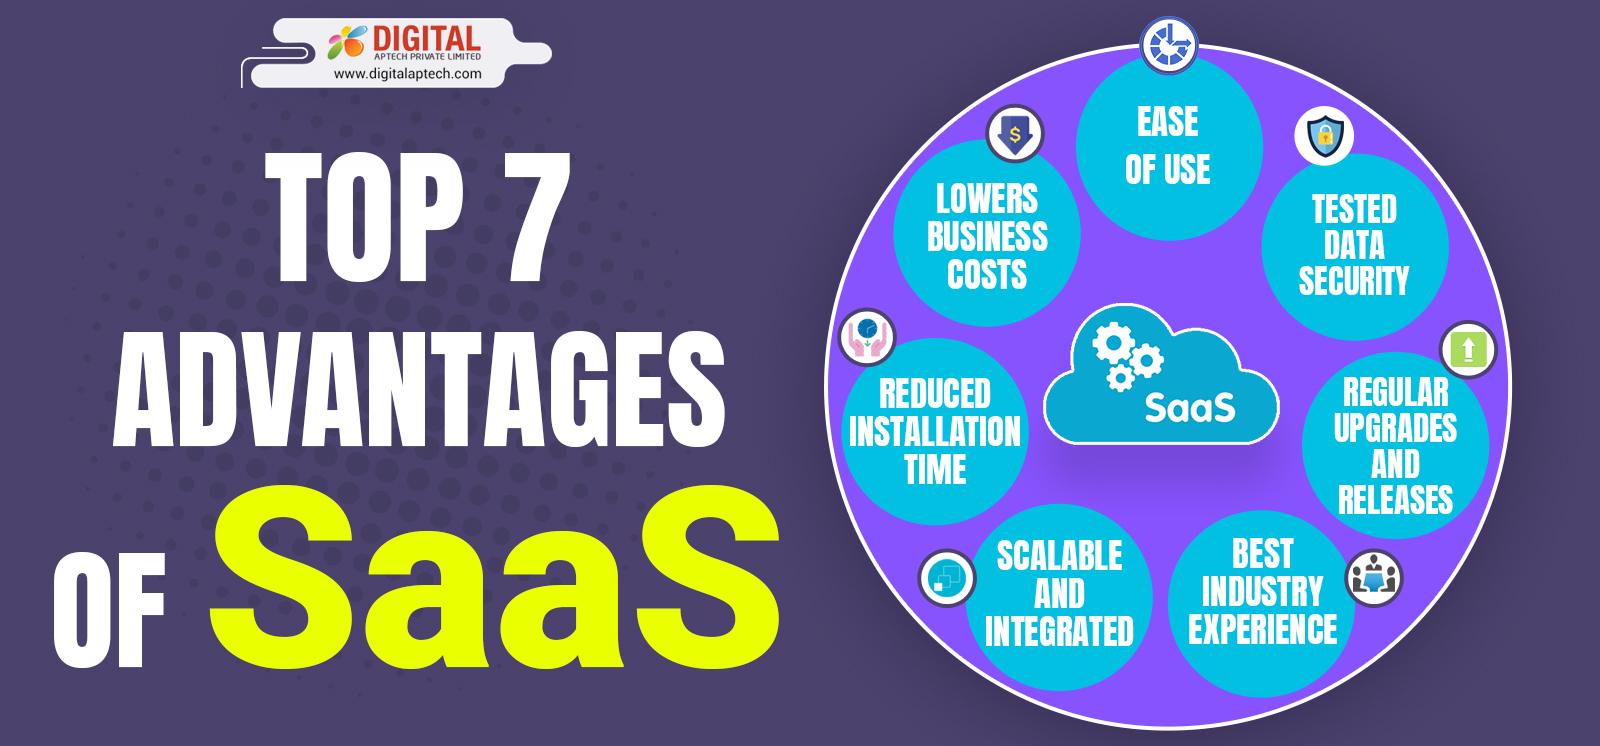 Top 7 Advantages of SaaS